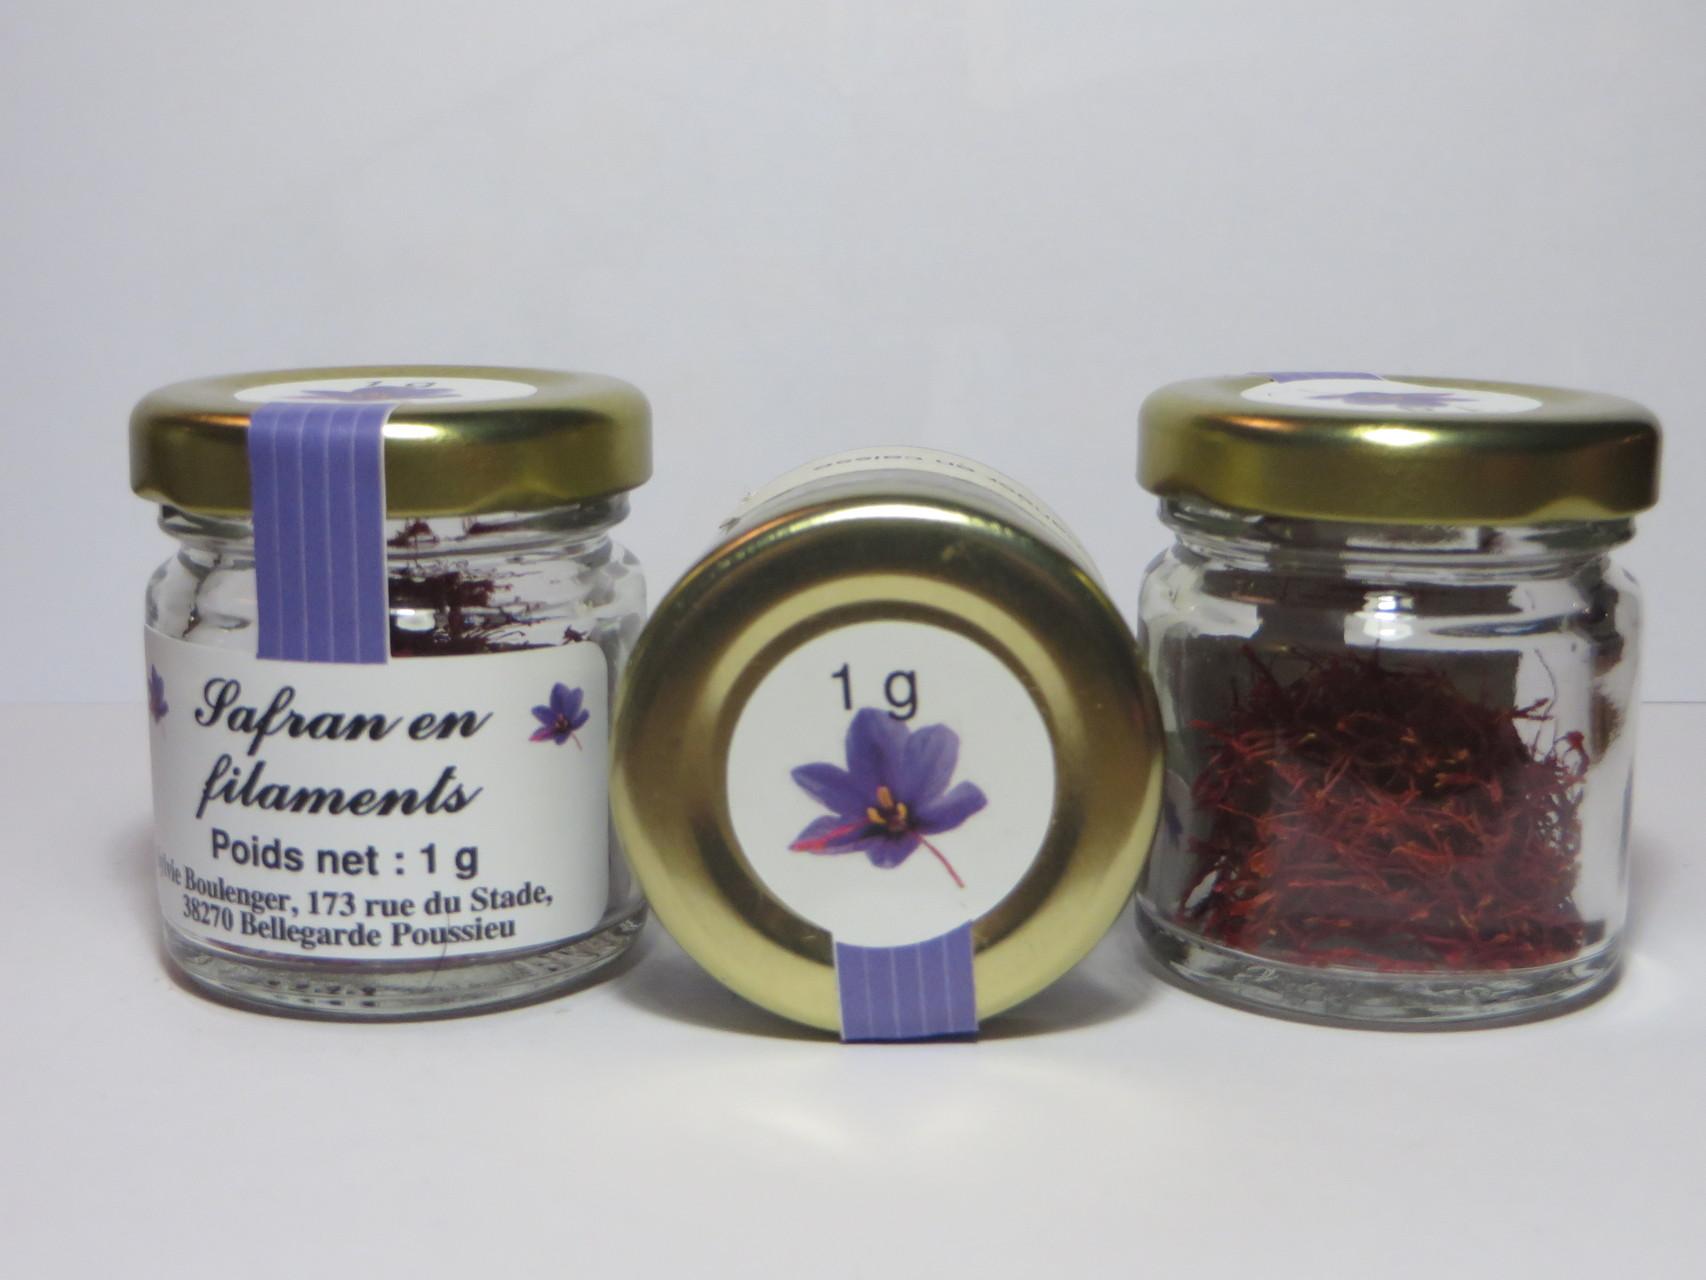 Safran 1 g